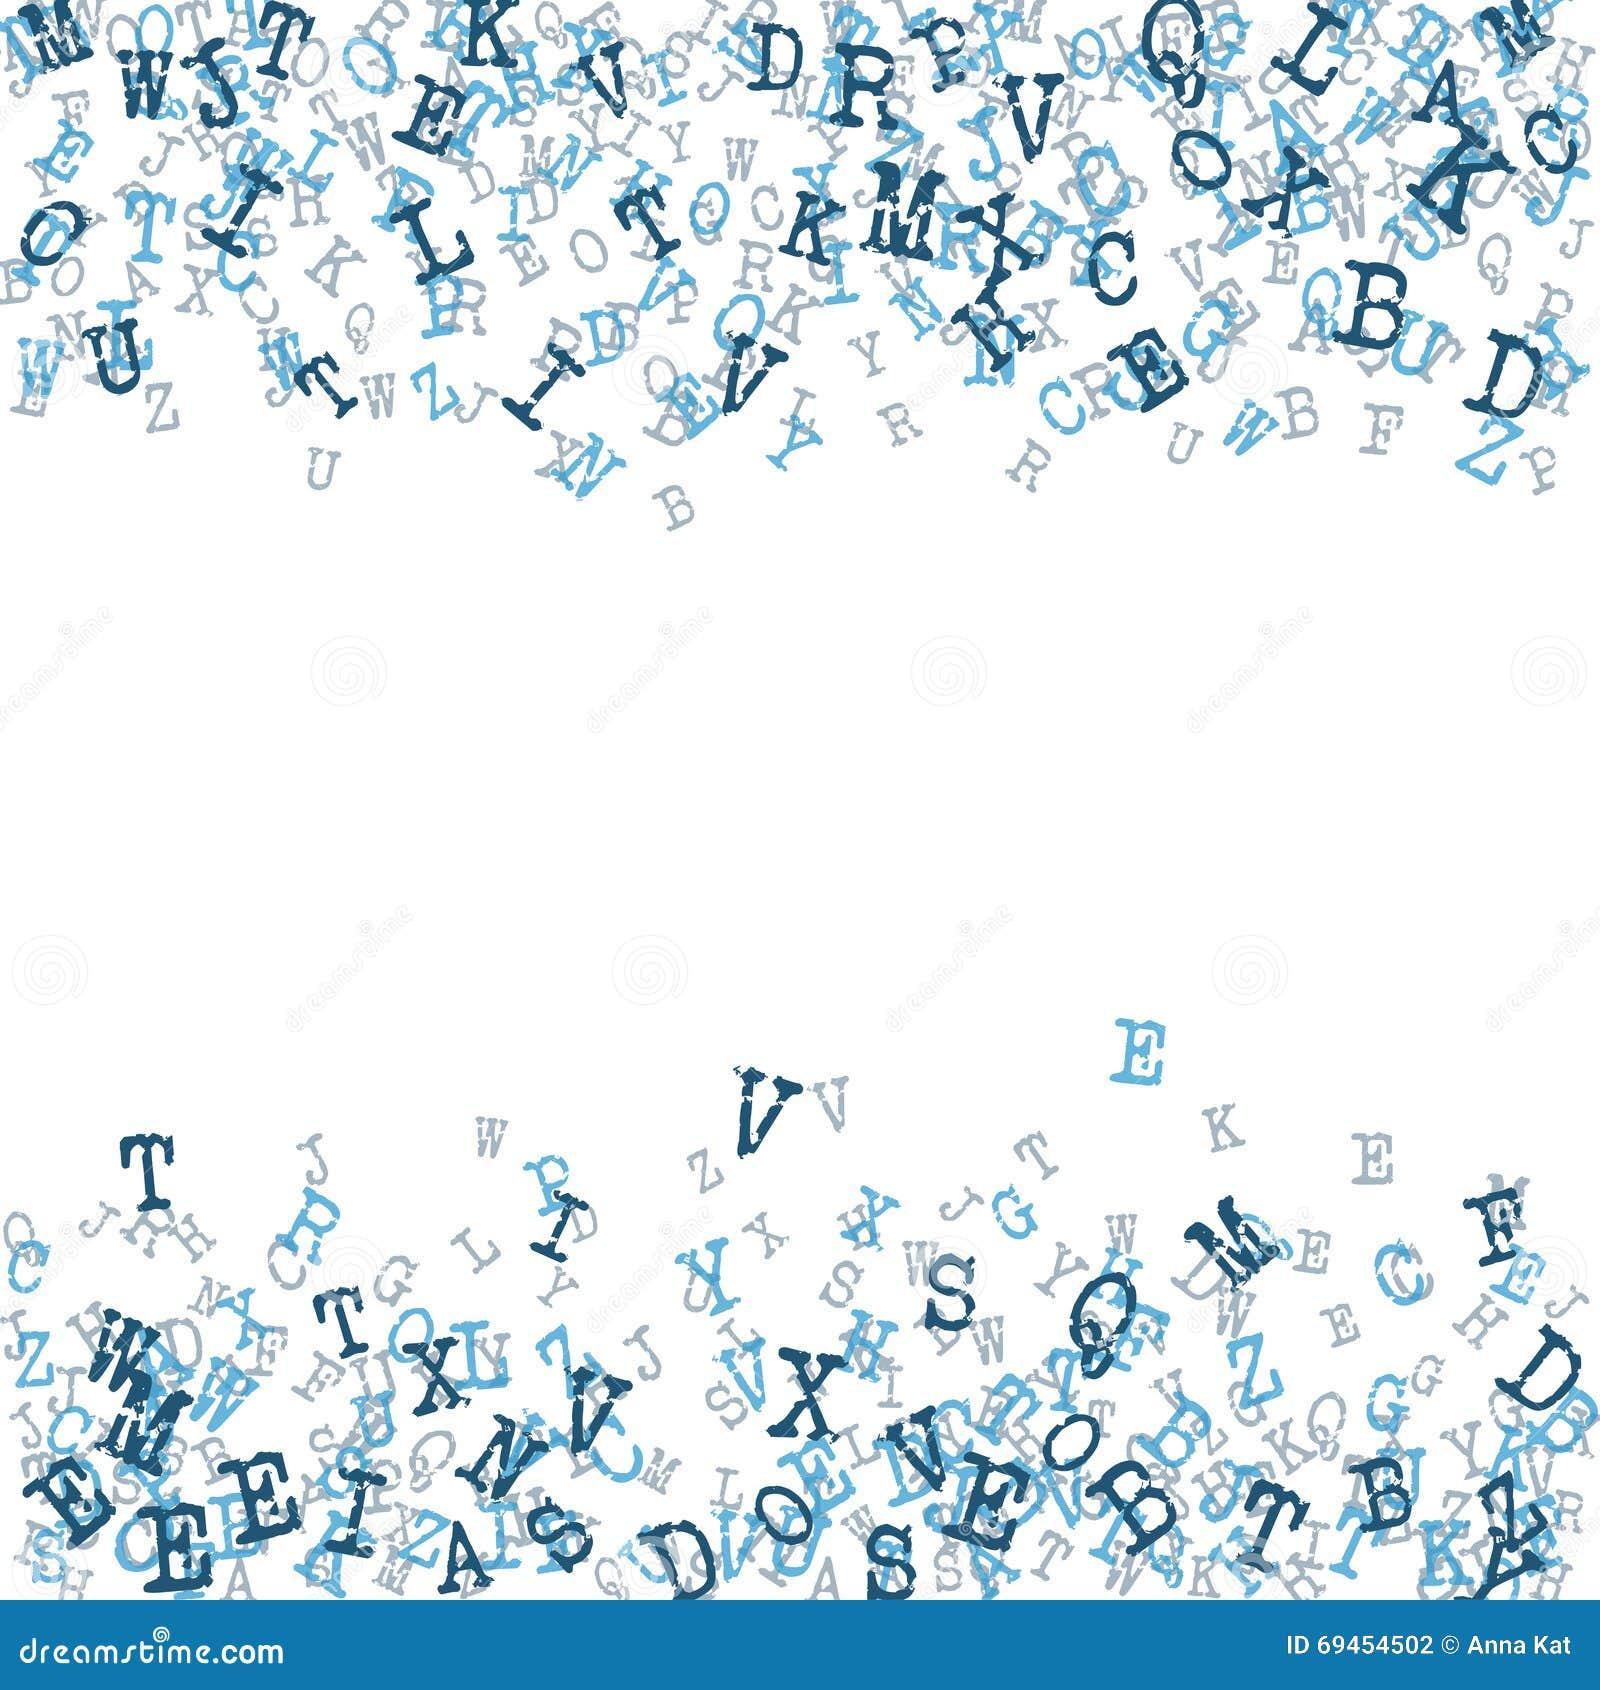 english letter s wallpaper